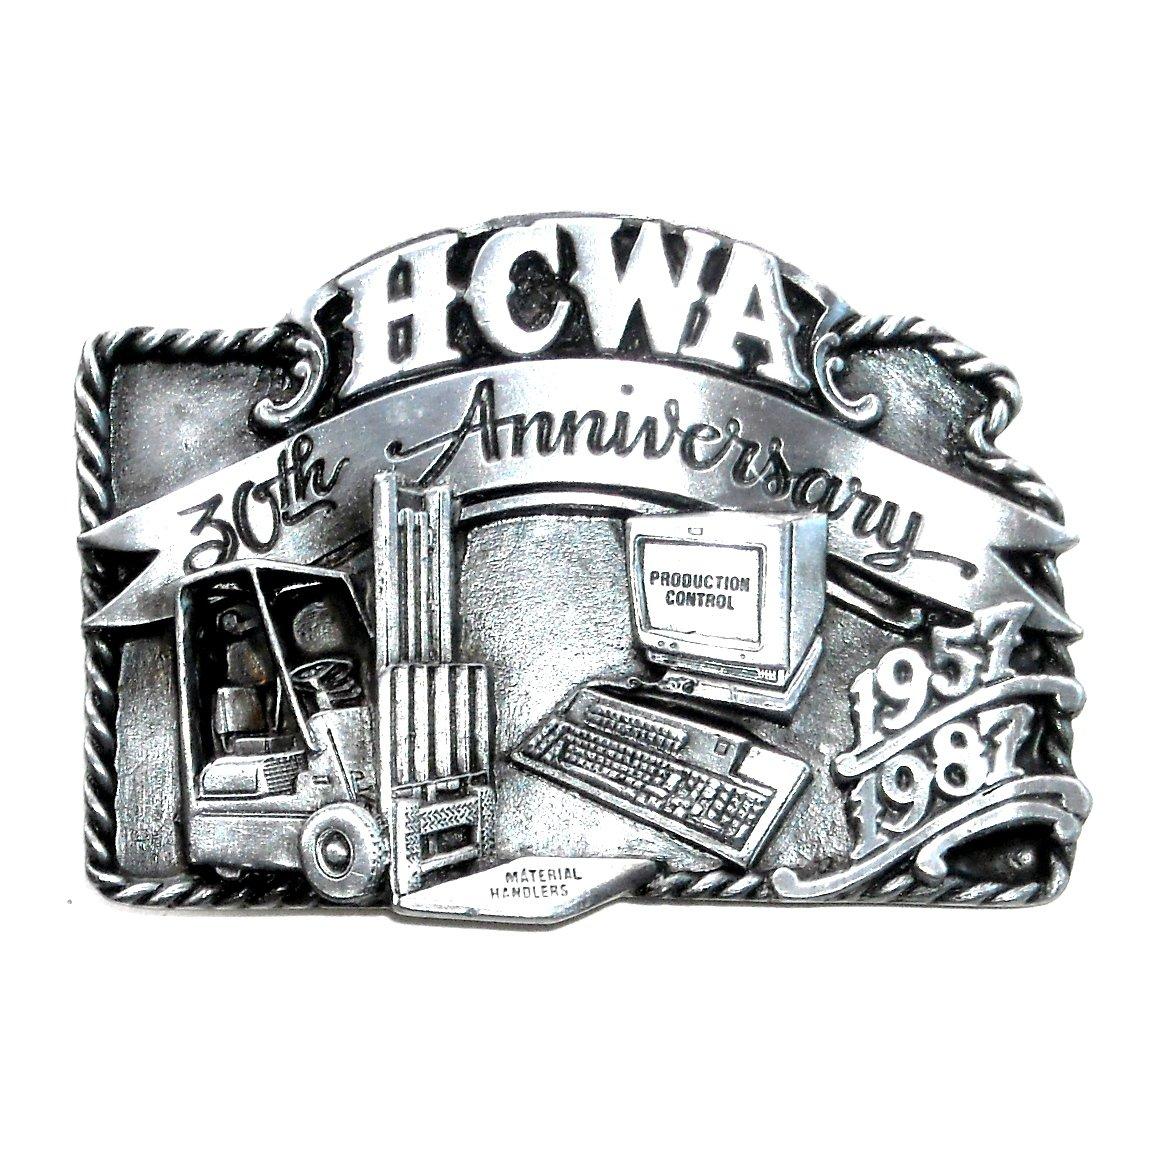 Hesston HCWA 1987 Vintage Bergamot US Pewter Belt Buckle